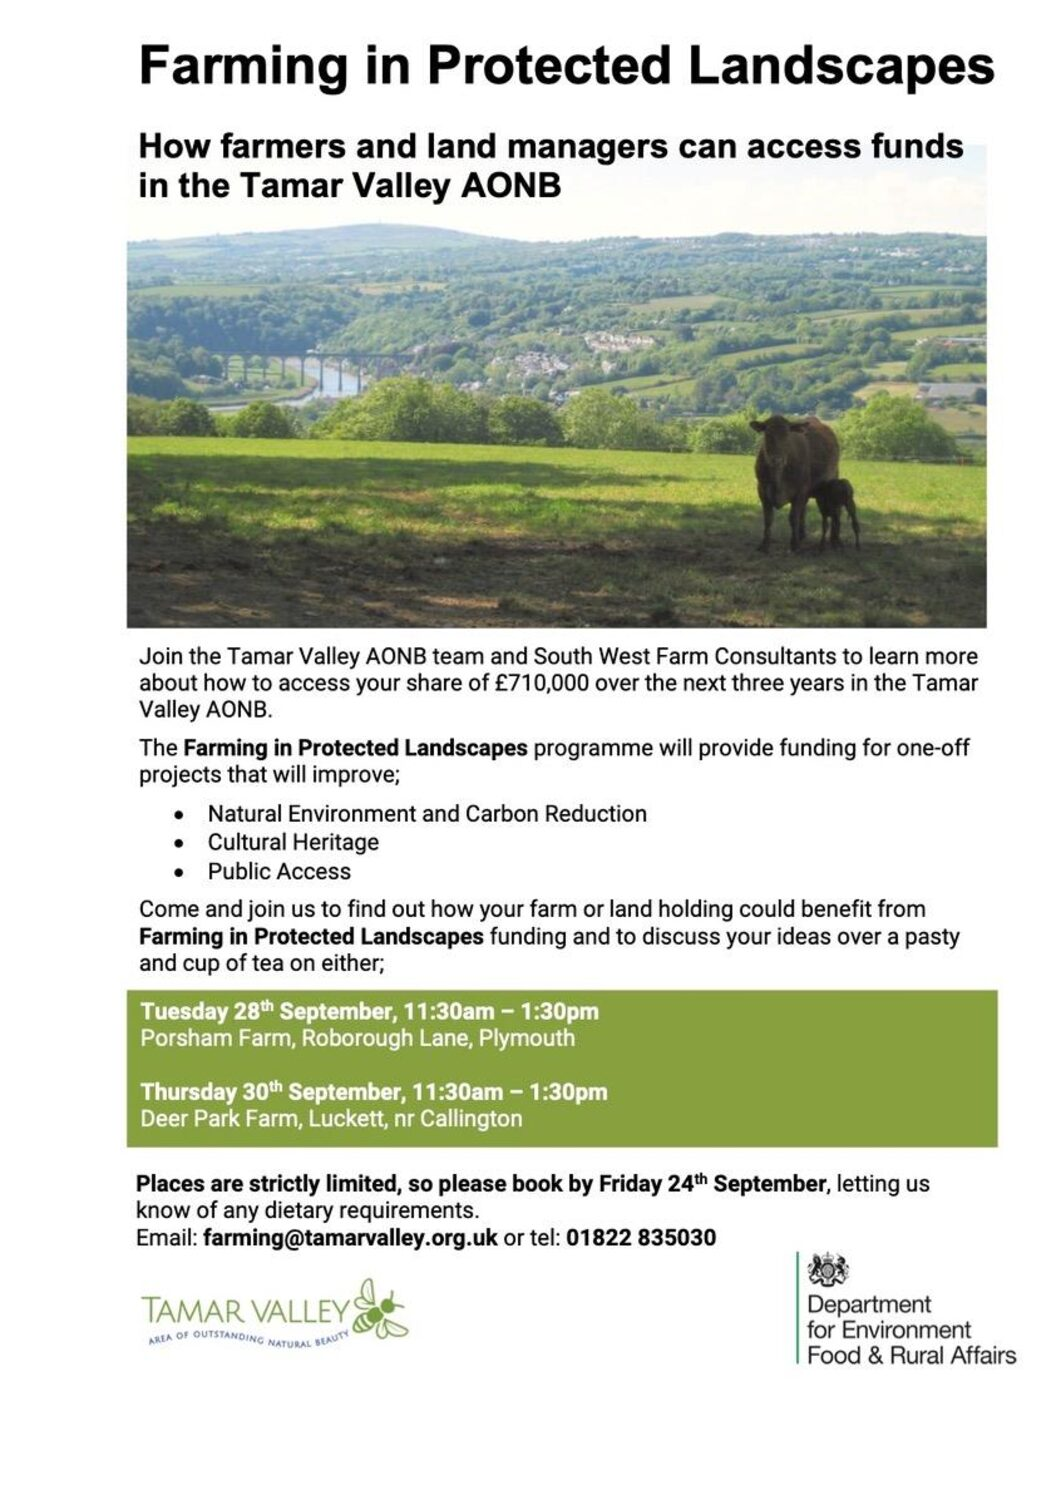 Tamara Landscape Partnership Farming Event